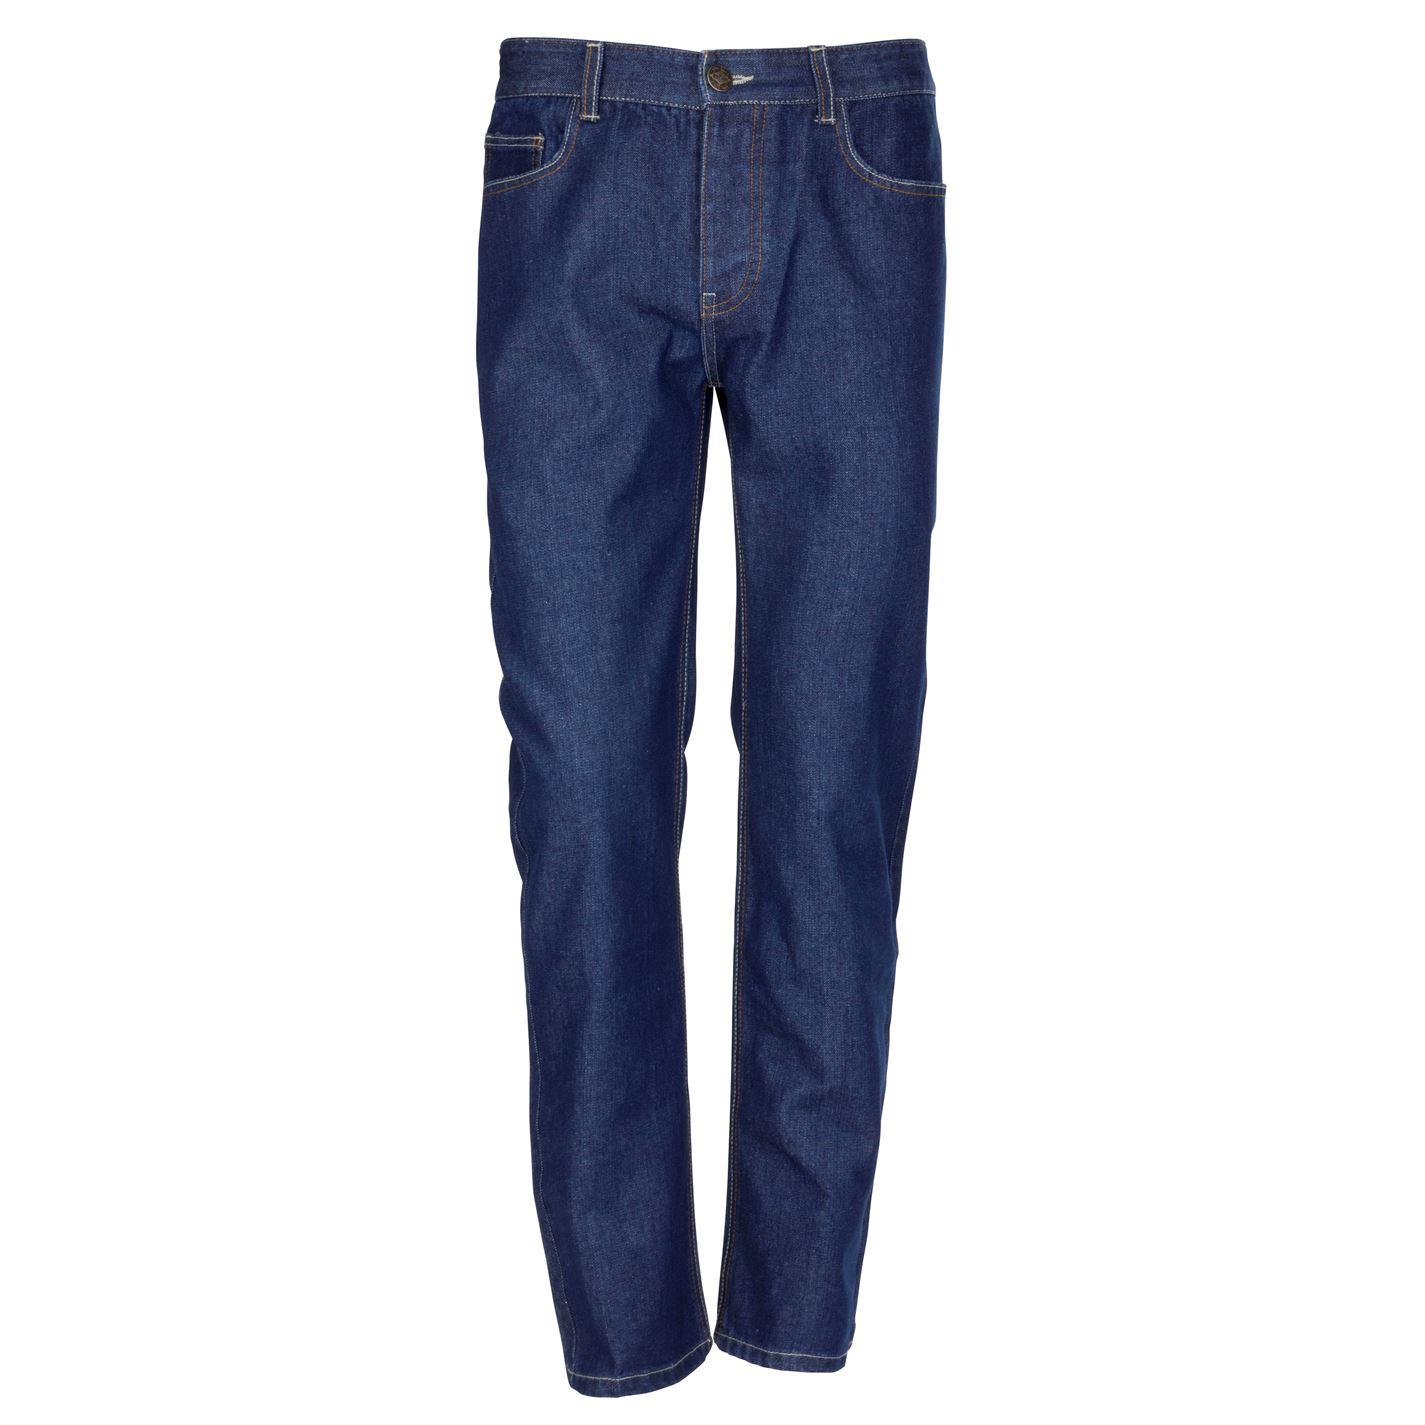 Lee Cooper Classic Regular Fit Jeans pánské Navy Dark Wash - Glami.cz d135acc392